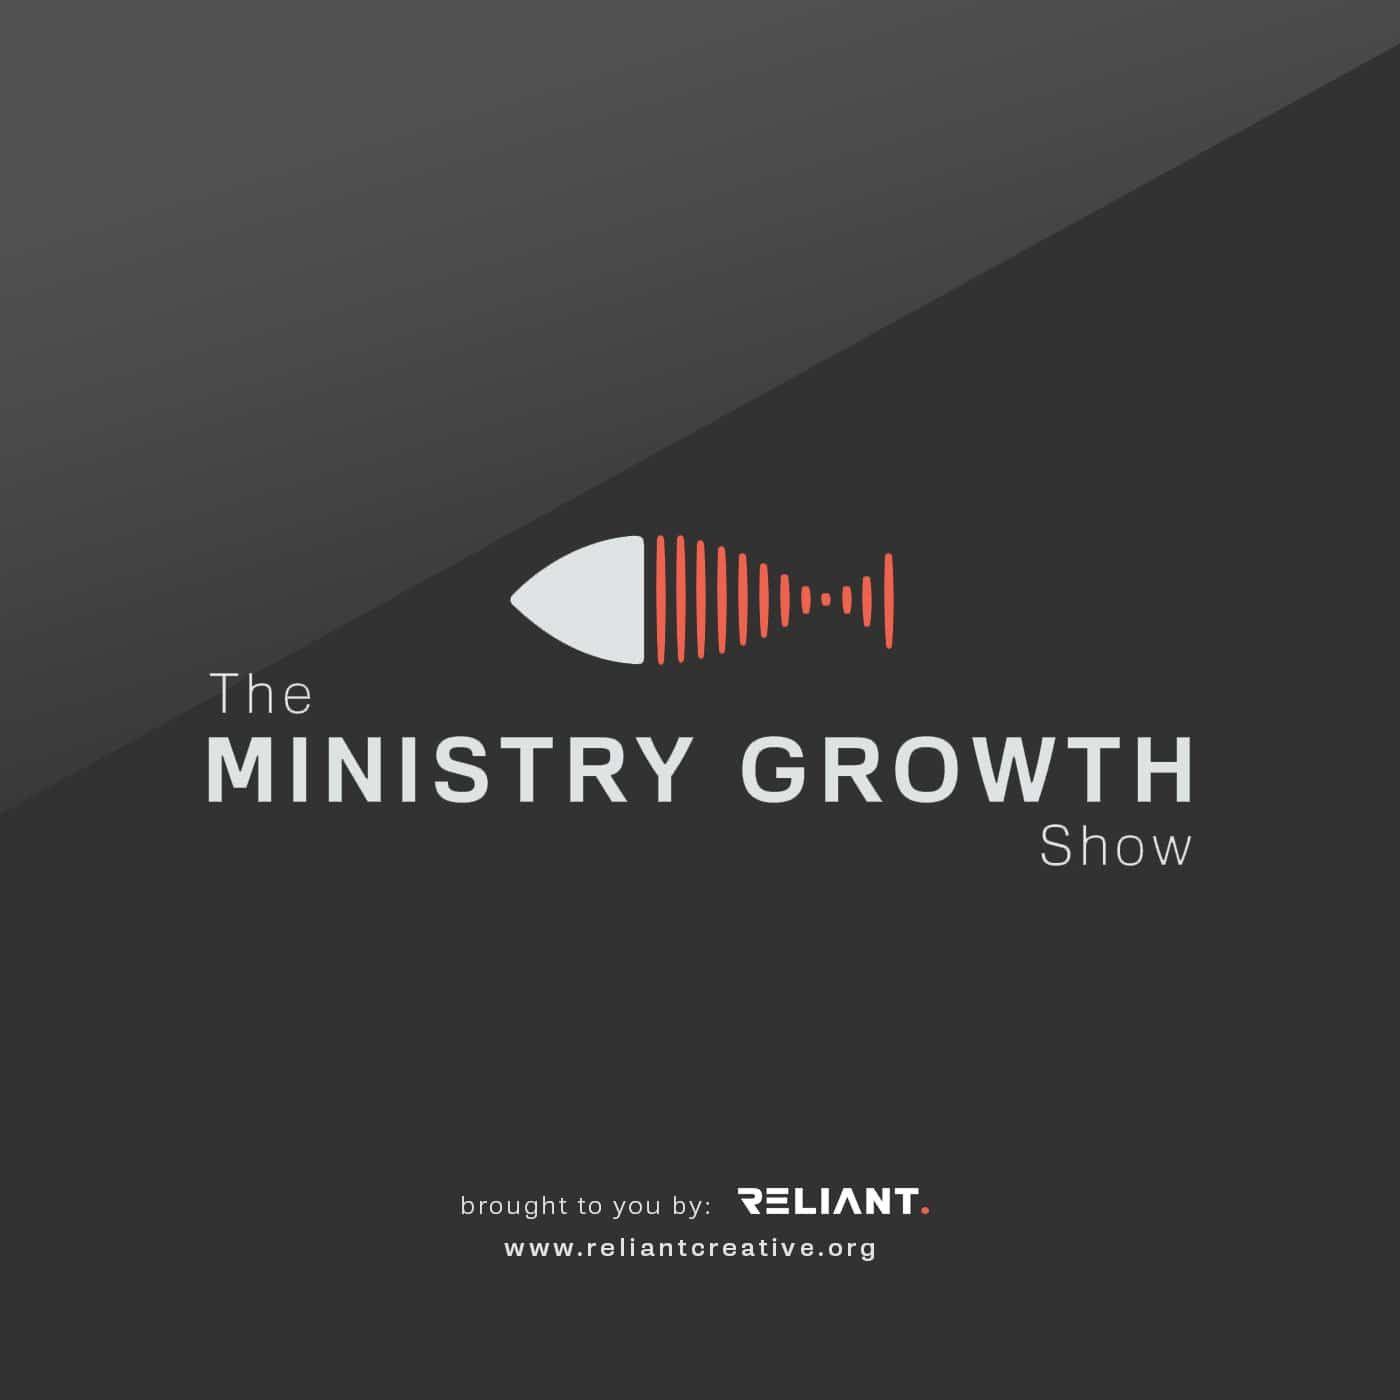 Jon Ralls from Kavanah Media – Social Media Marketing for Ministries